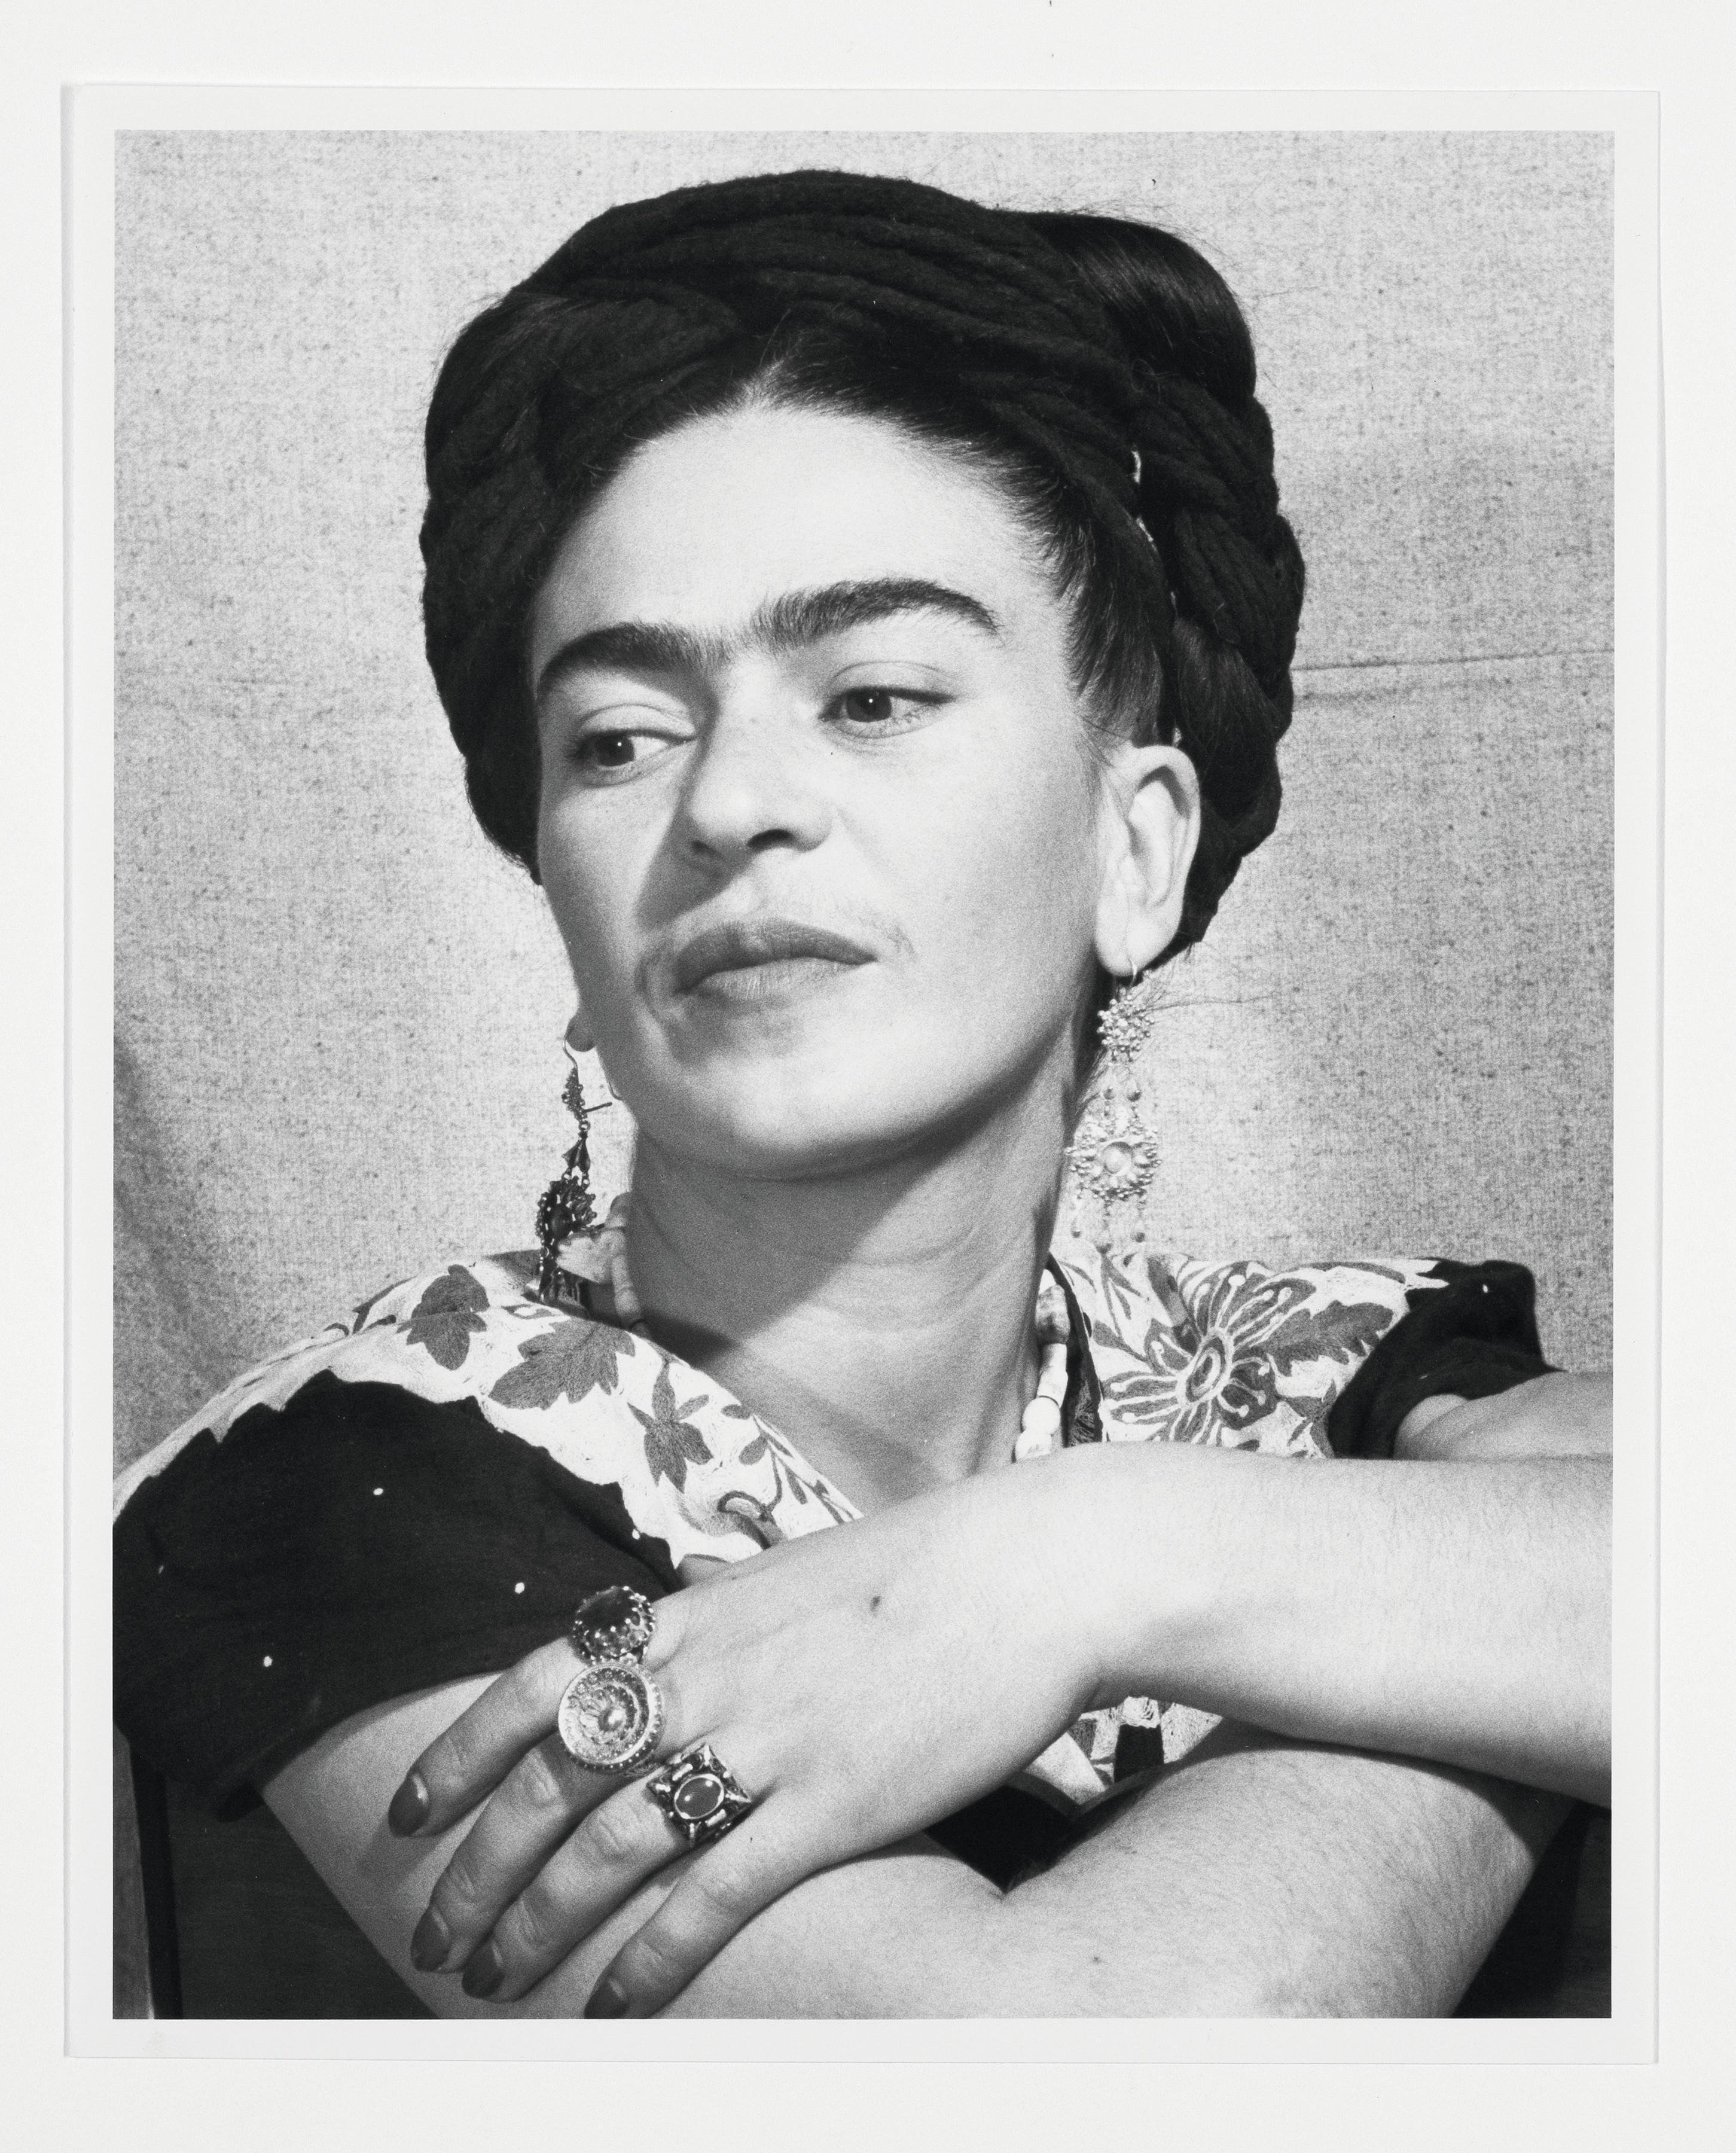 Bernard Silberstein, portrait de Frida Kahlo, artiste mexicaine, 1940, photographie, Detroit Institute of Arts, États-Unis.